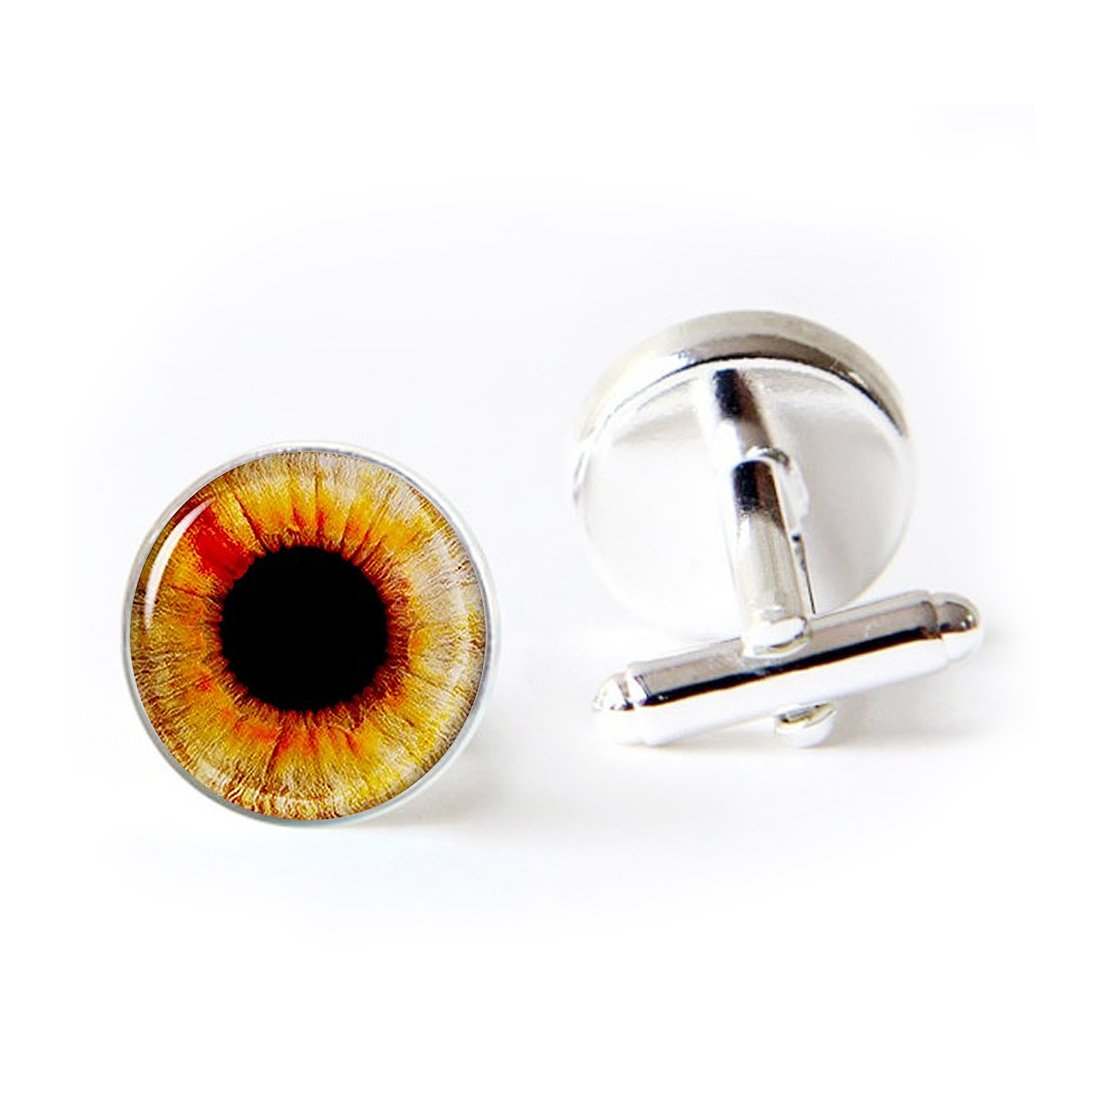 LooPoP Round Cufflink Set Black Pupil Eyeball Cufflinks For Men's Accessories Shirts Business Wedding